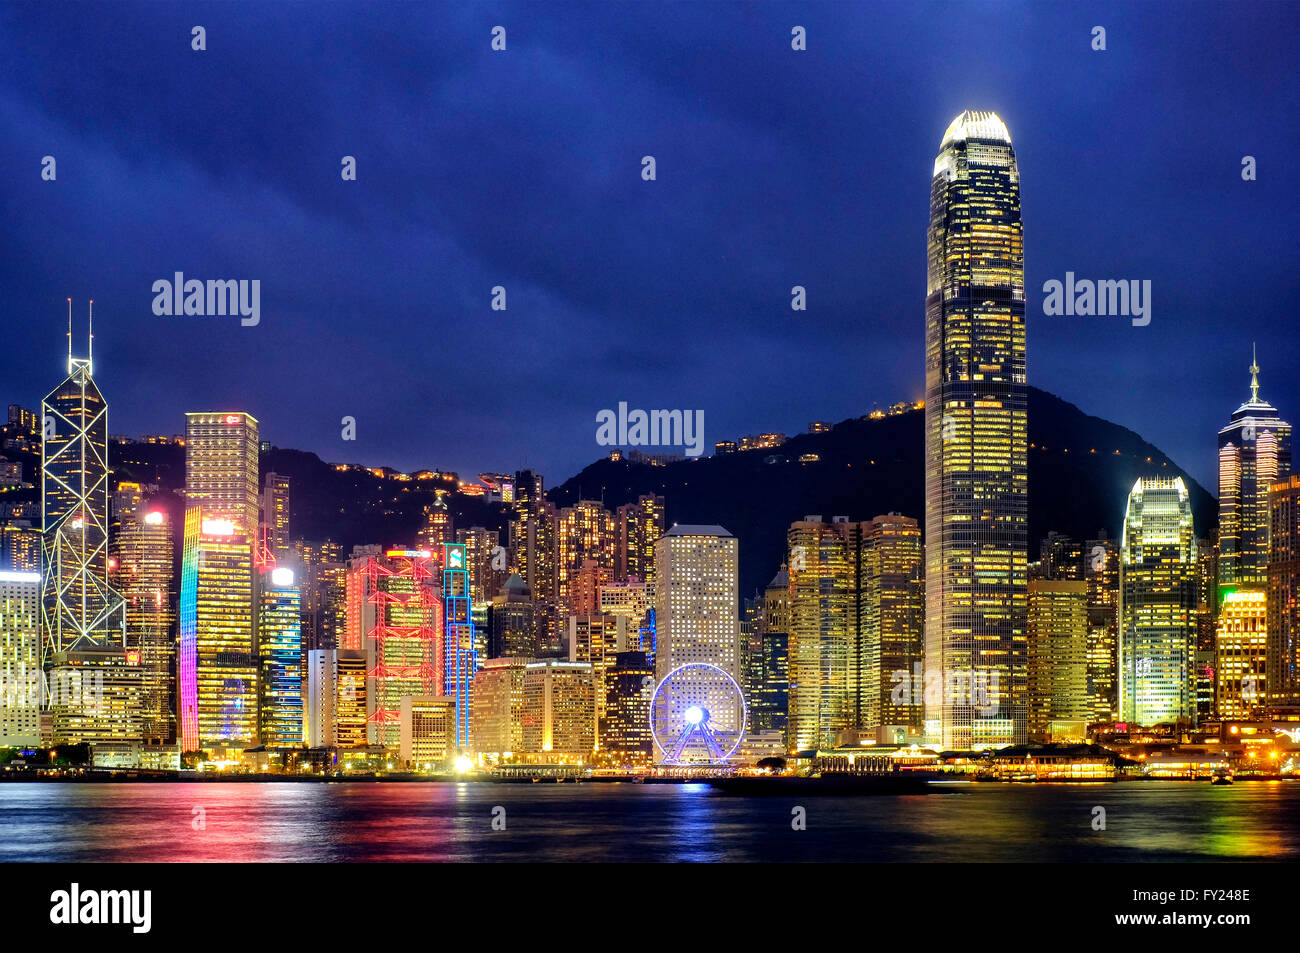 Isola di Hong Kong skyline dal Victoria Harbour, Hong Kong, Cina Immagini Stock